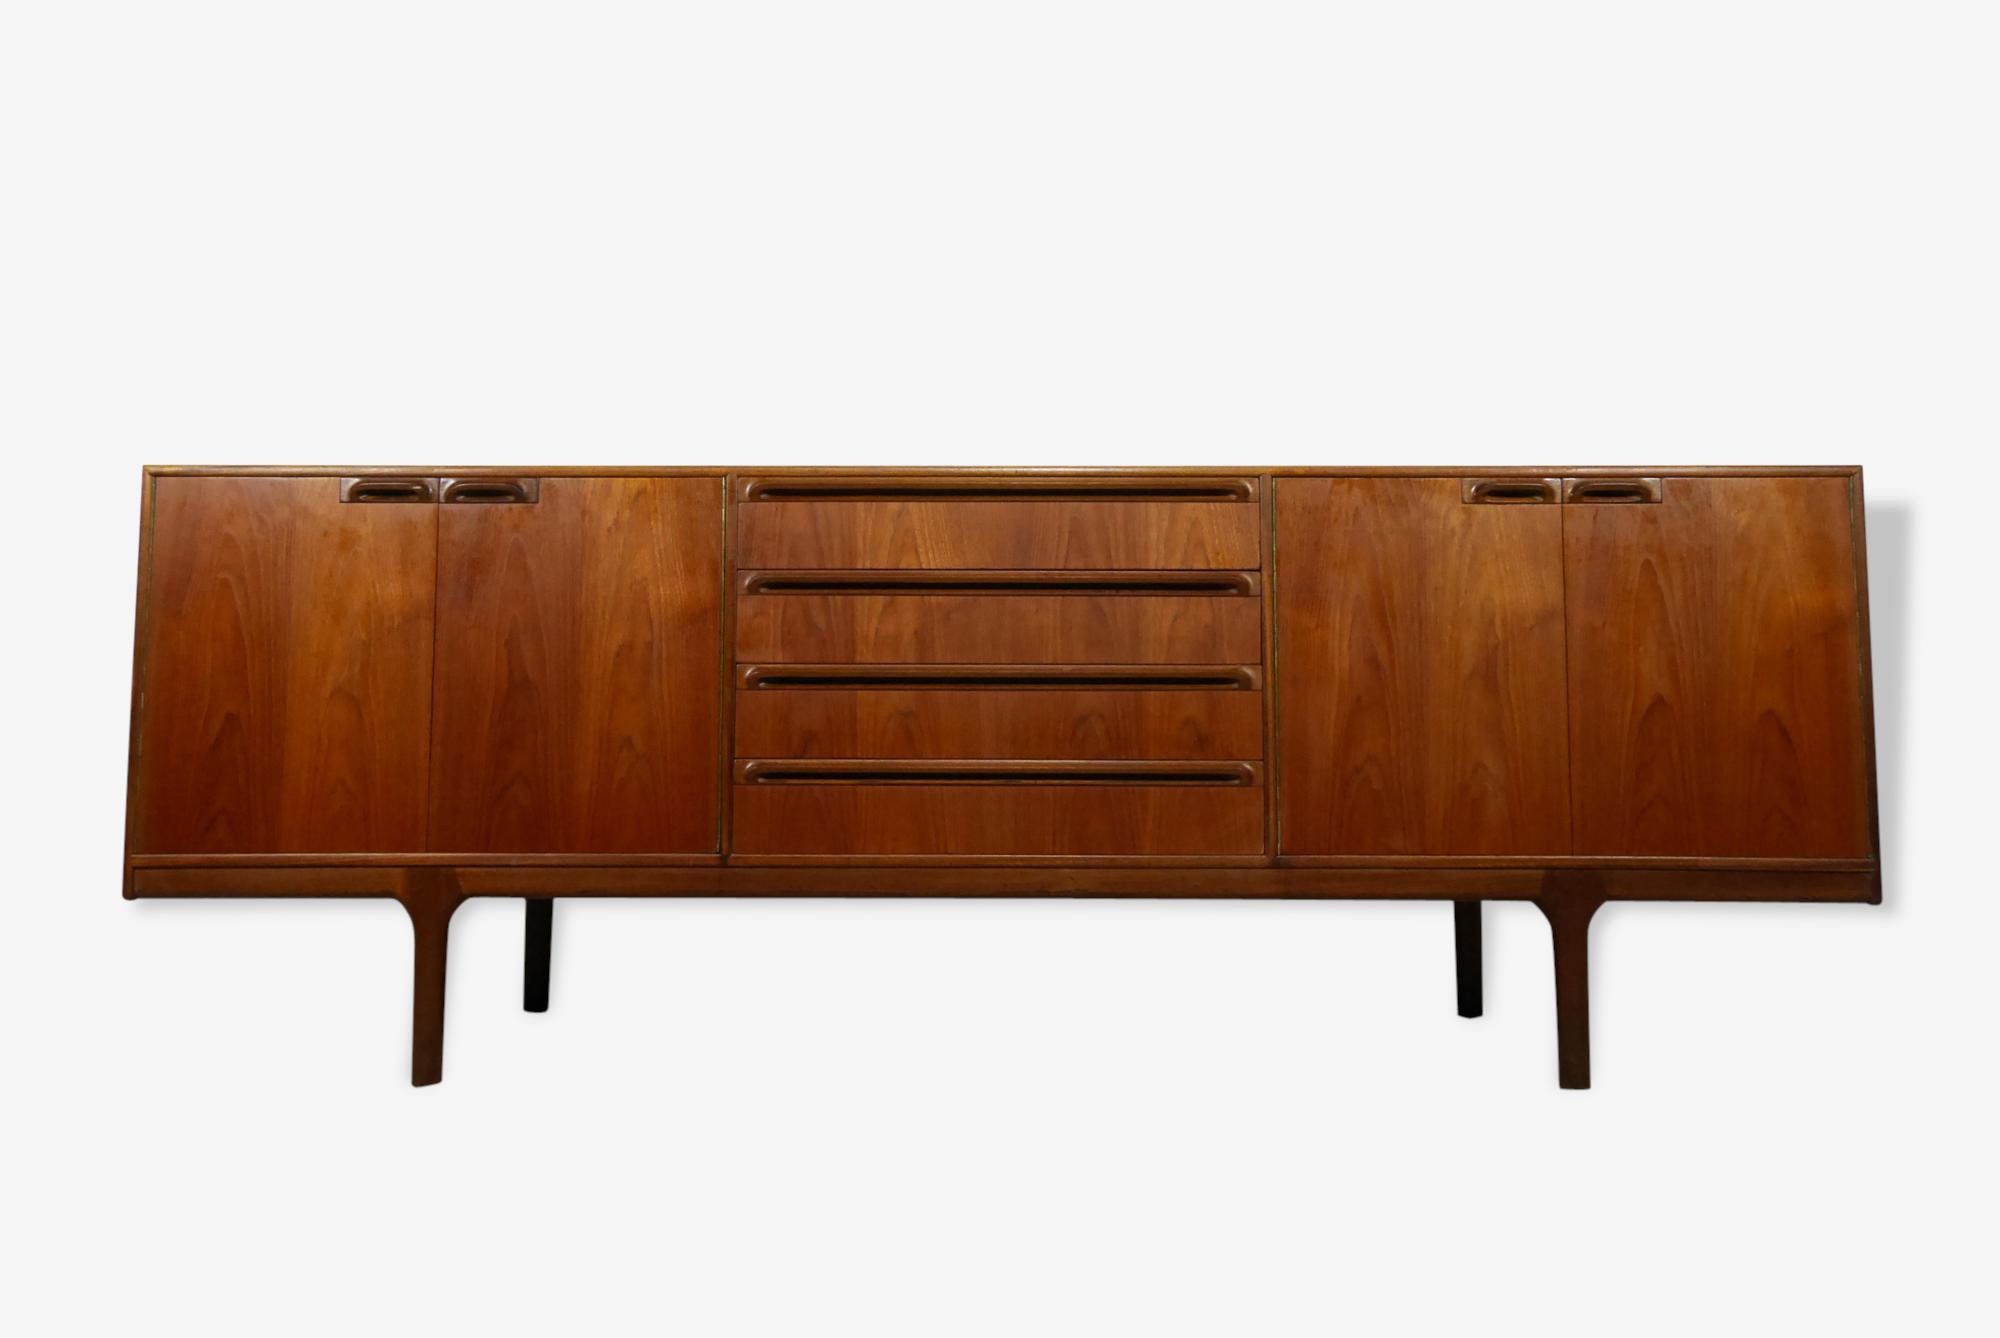 Enfilade McIntosh by Tom Robertson - 213 cm